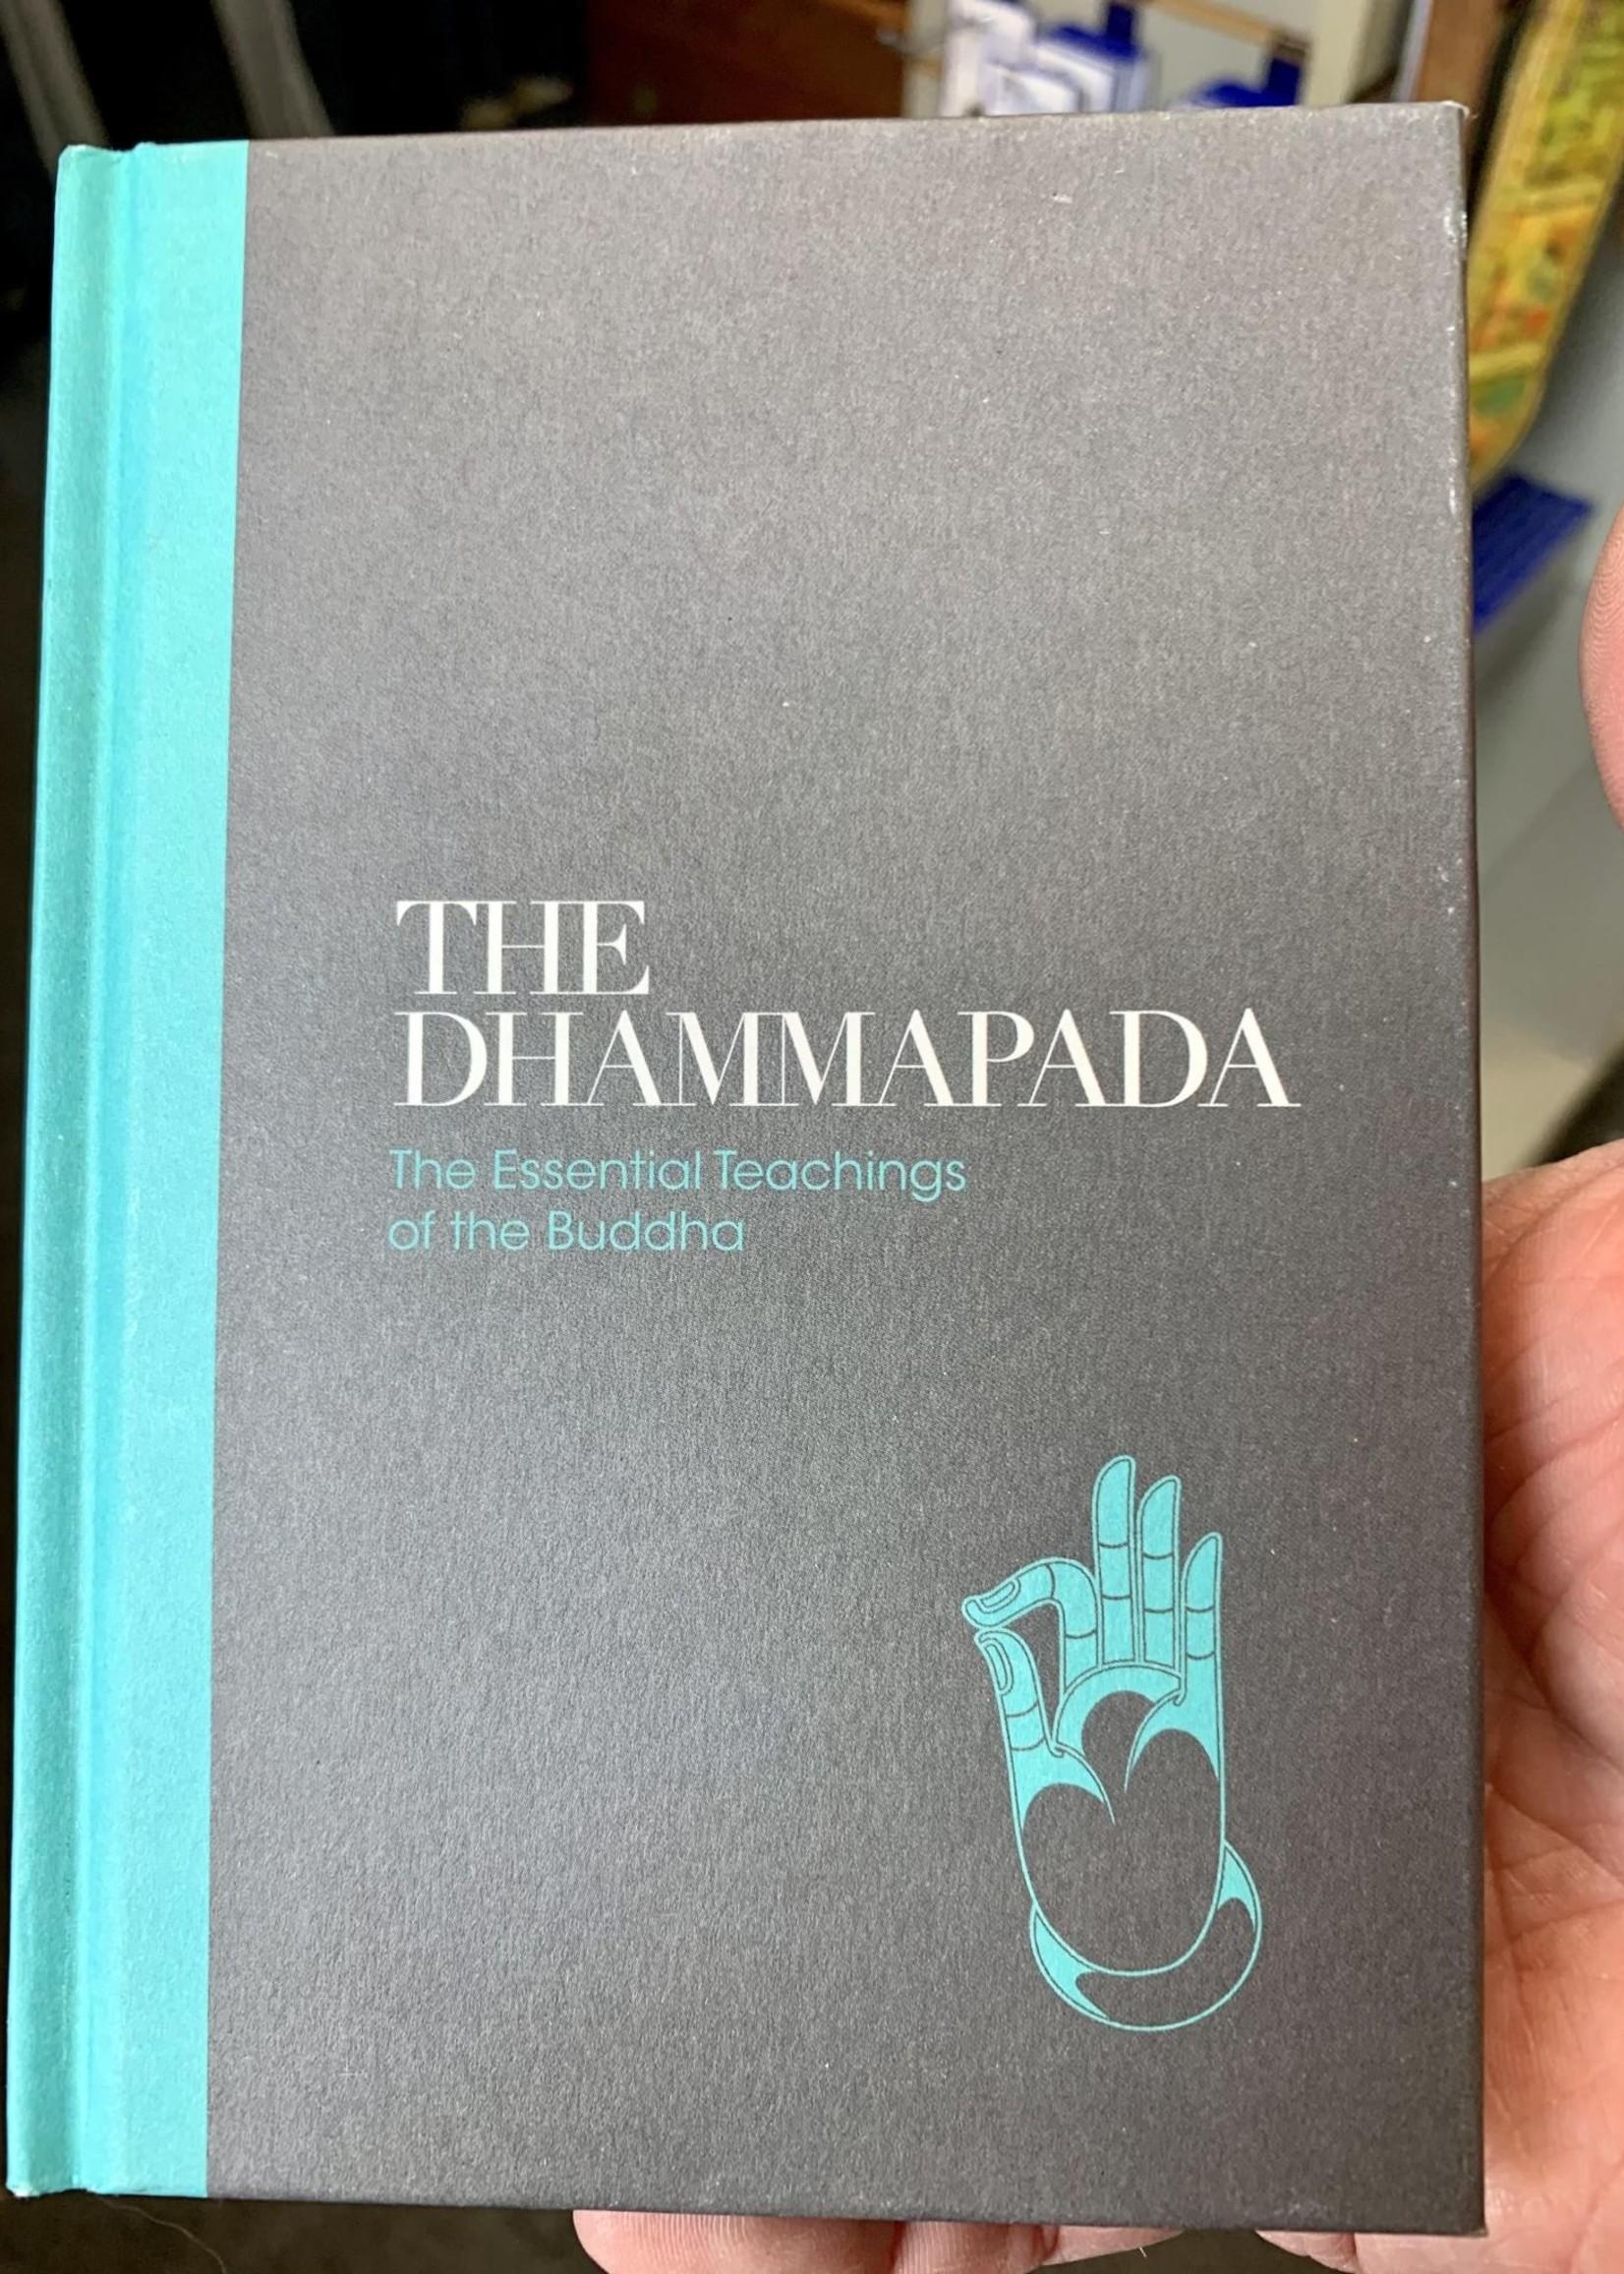 Dhammapada - The Essential Teachings of the Buddha